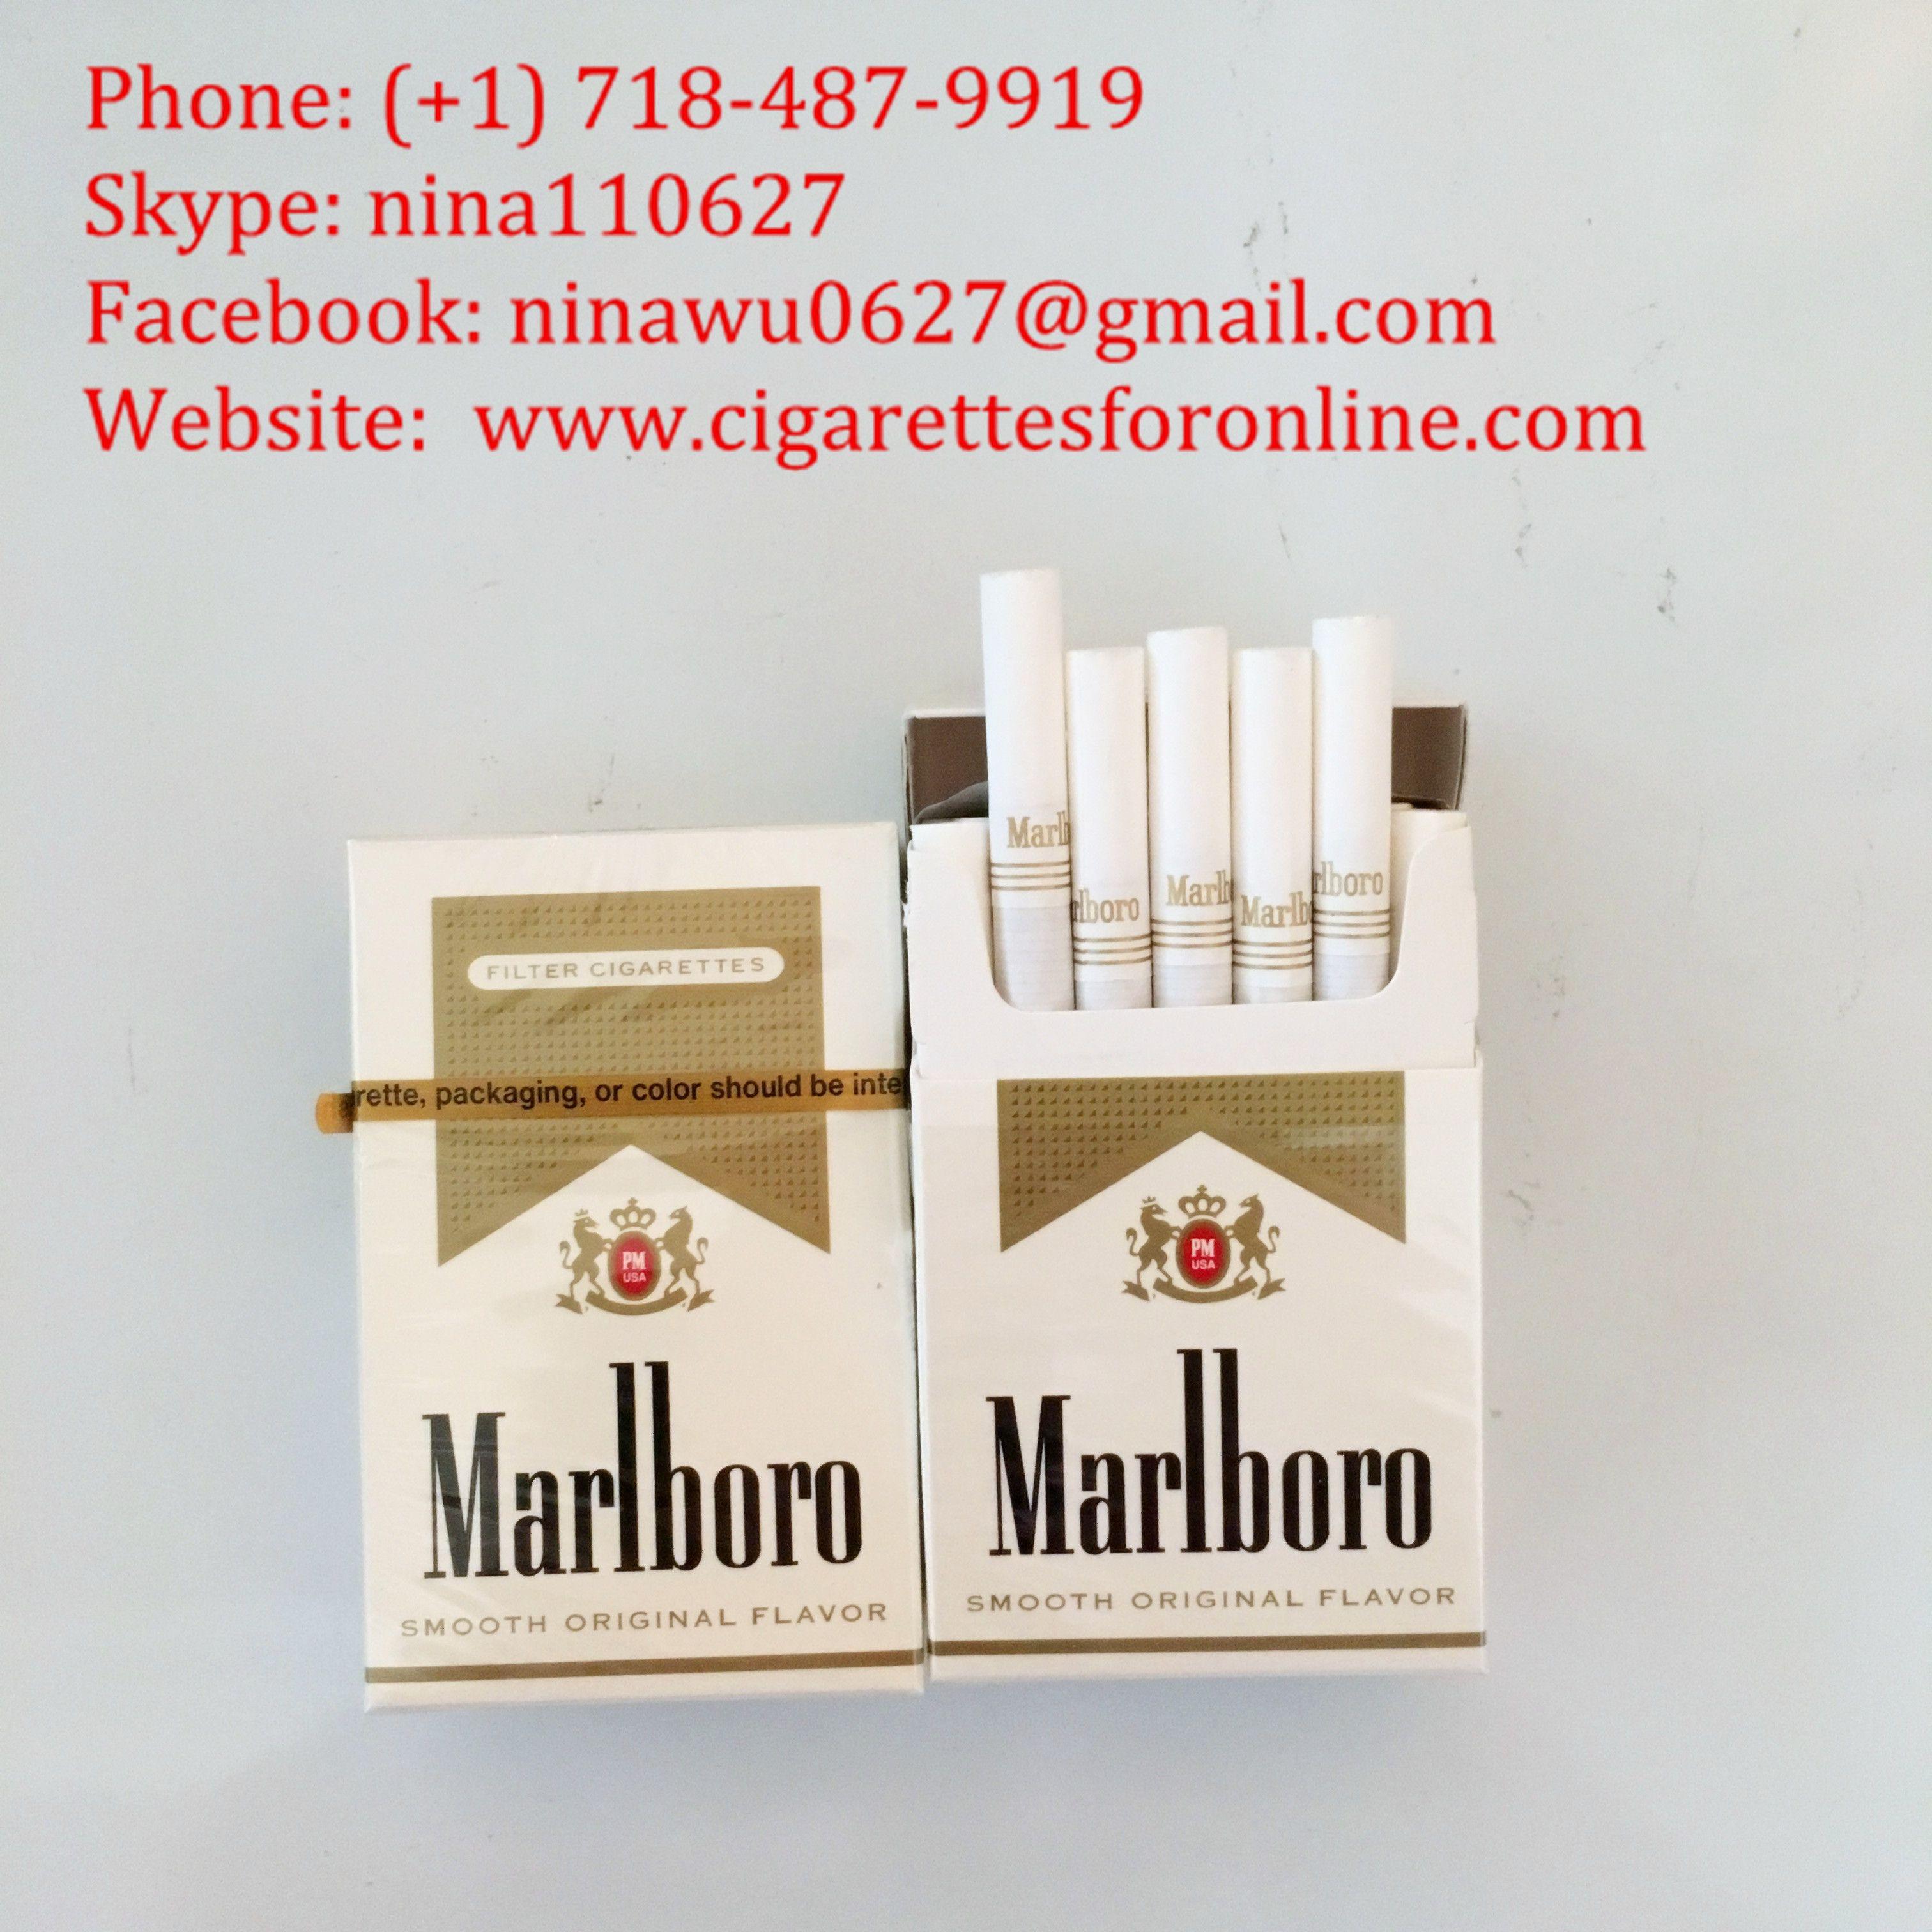 sell newest marlboro gold regular cigarettes www